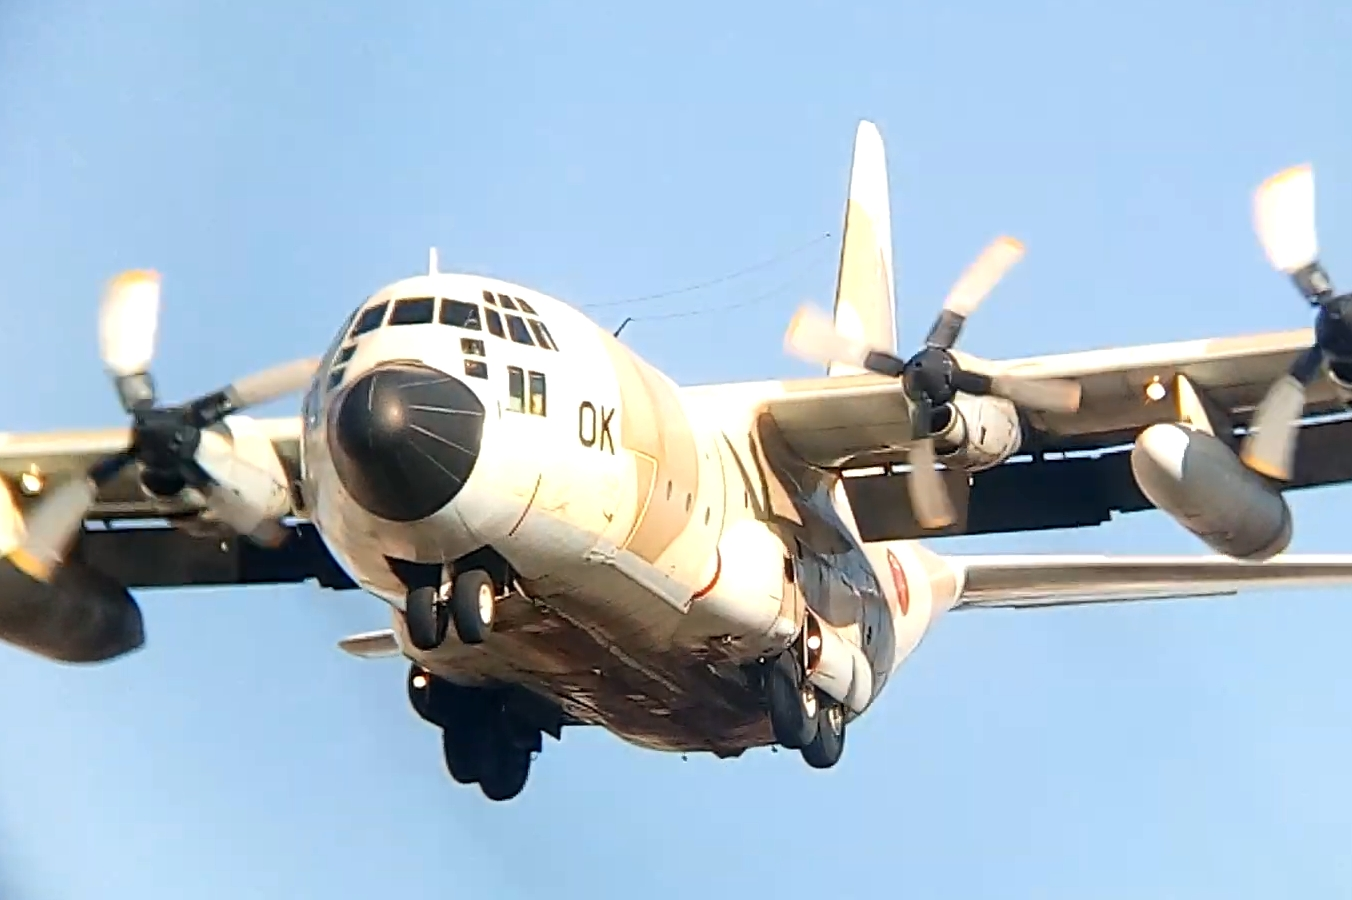 FRA: Photos d'avions de transport - Page 42 Aok10